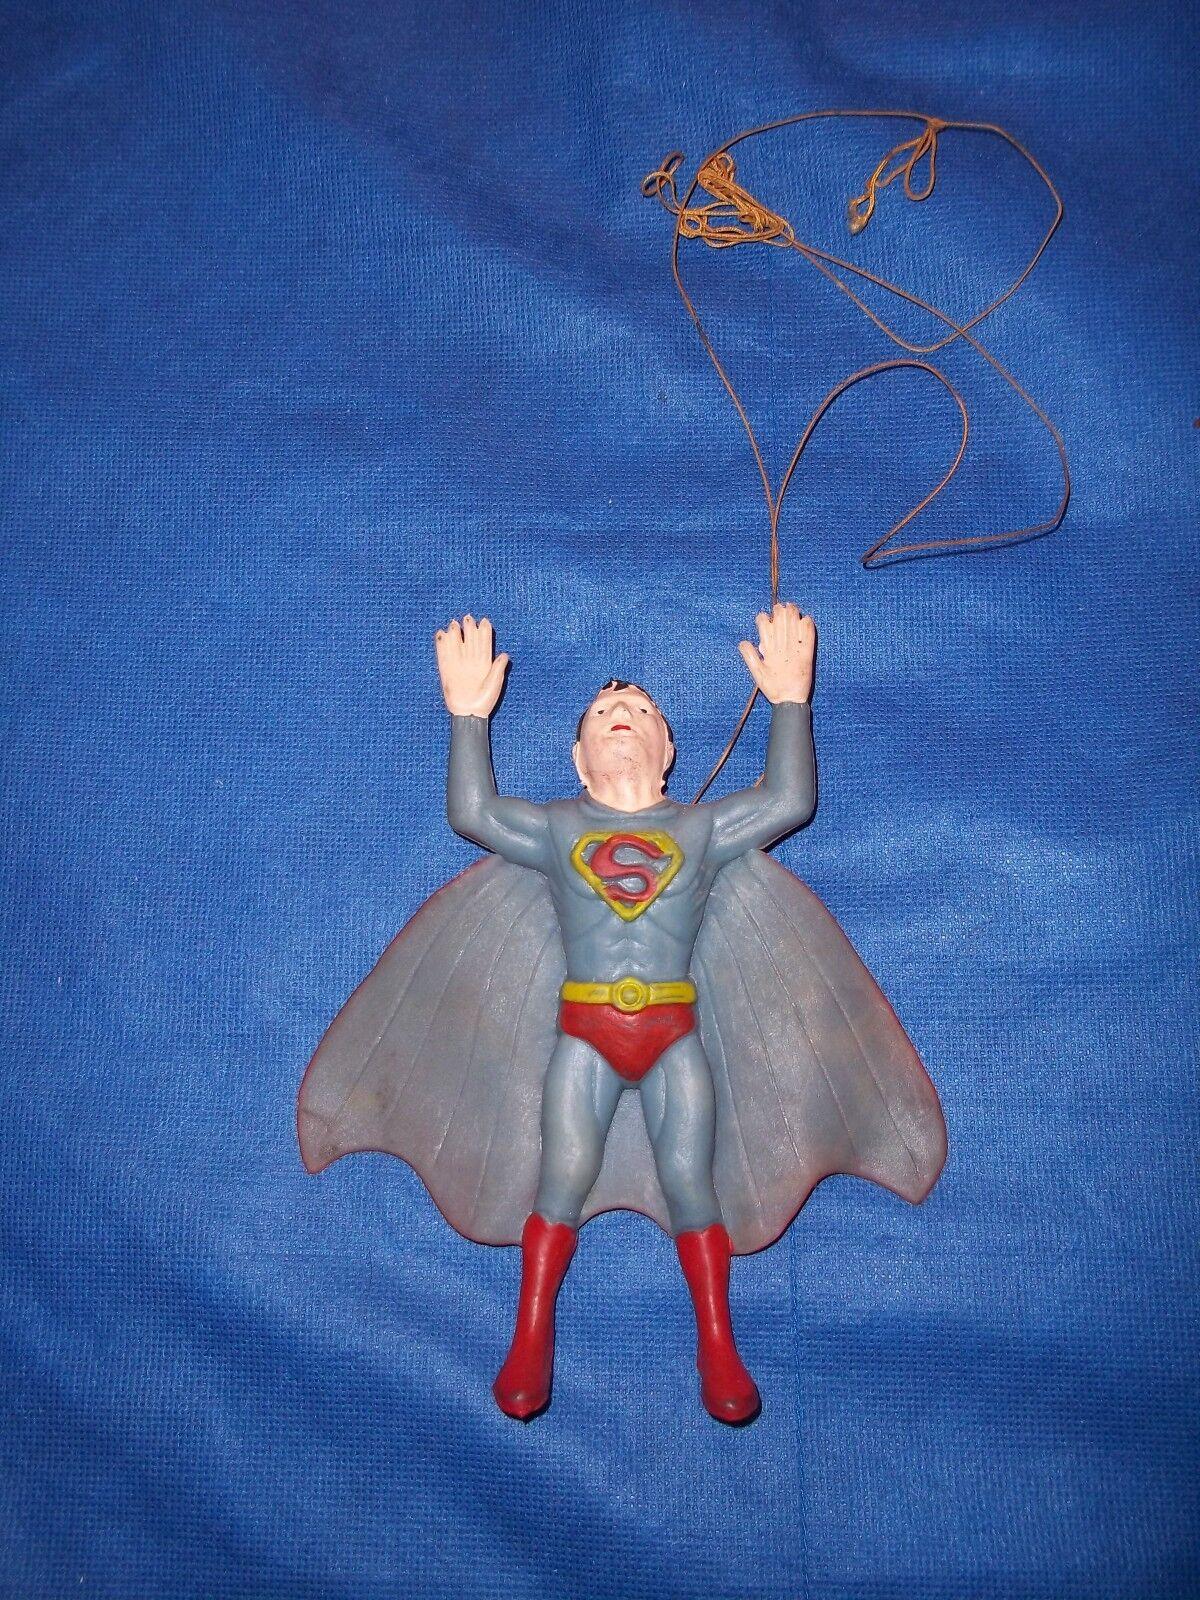 Vintage 1973 Ben Cooper Rubber Dangling  Superman  7  Action Figure